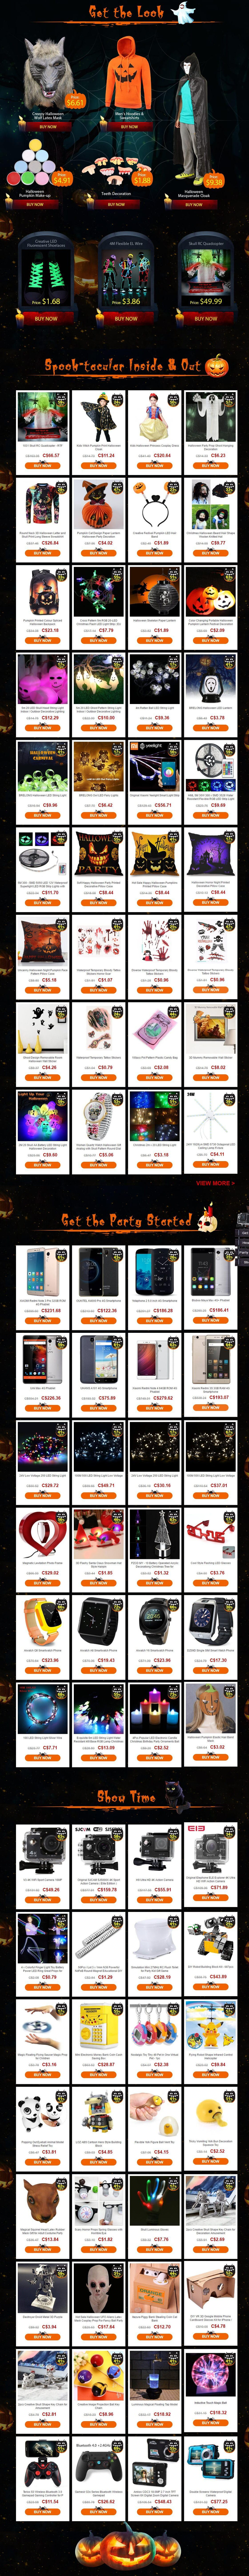 Product List- Gearbest's Epic Halloween Flash Sale